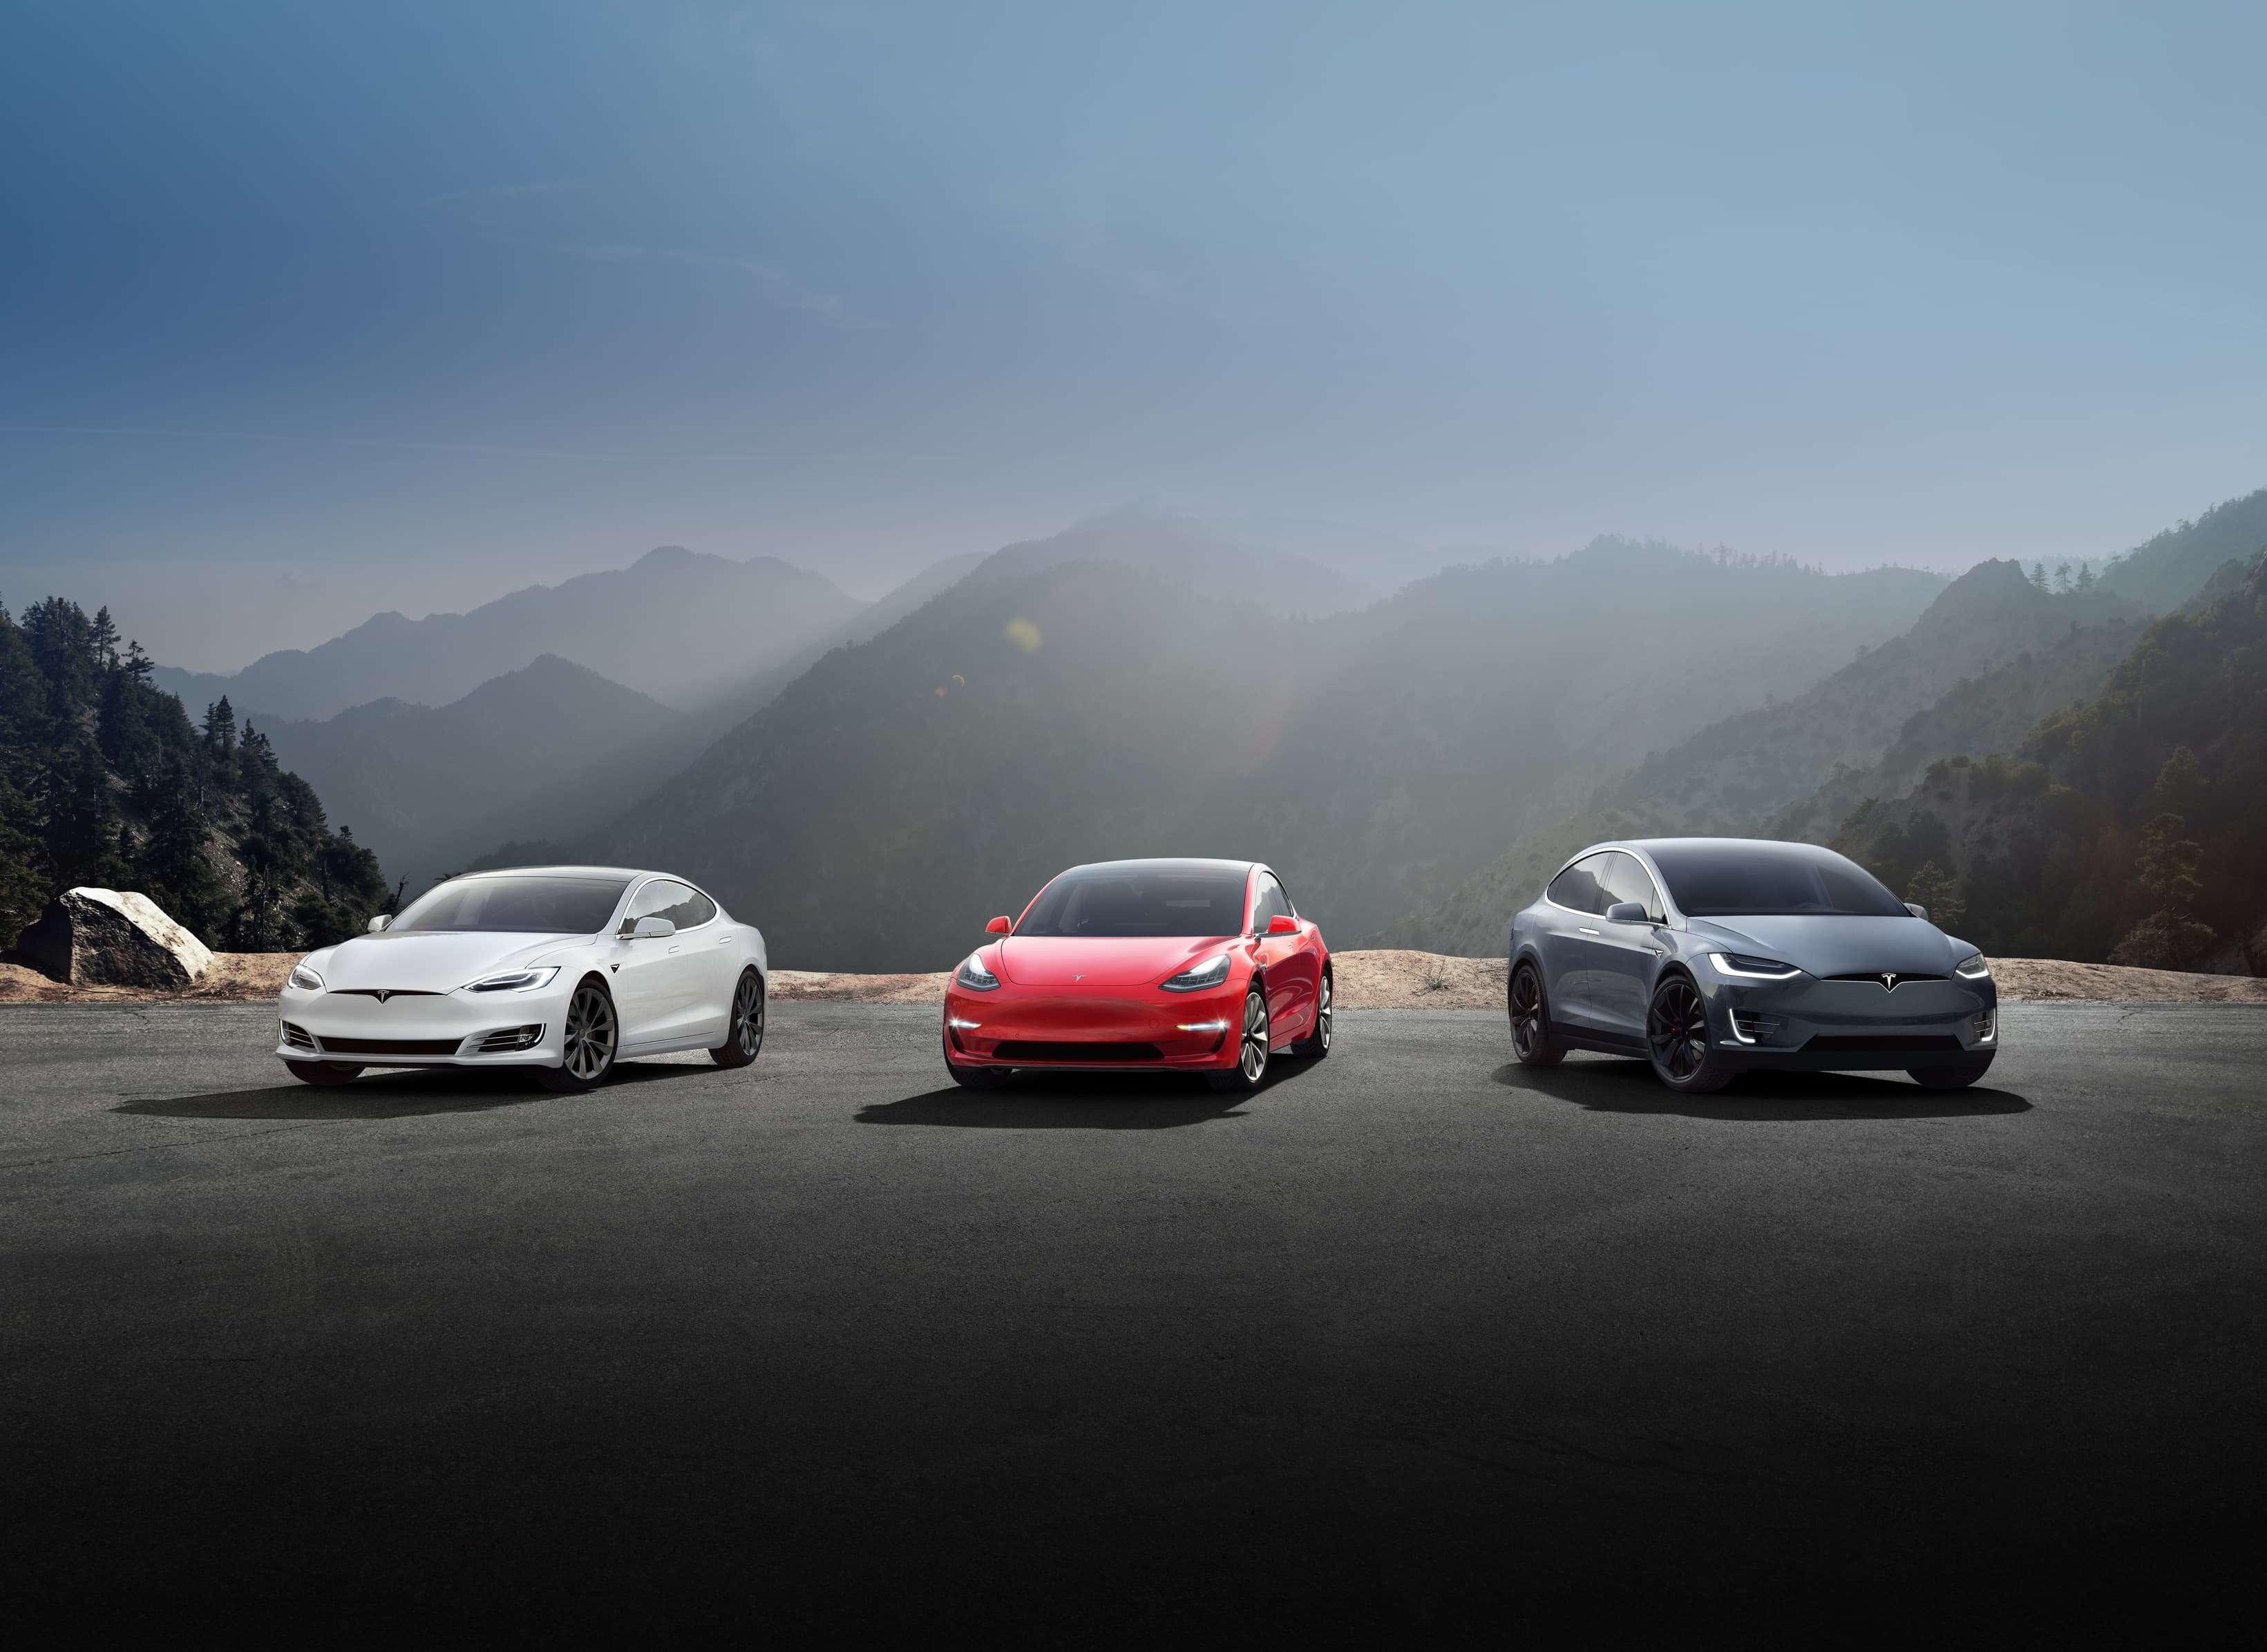 Tesla: Model S and X $5,000 Price cut / Model 3 $2000 Price cut